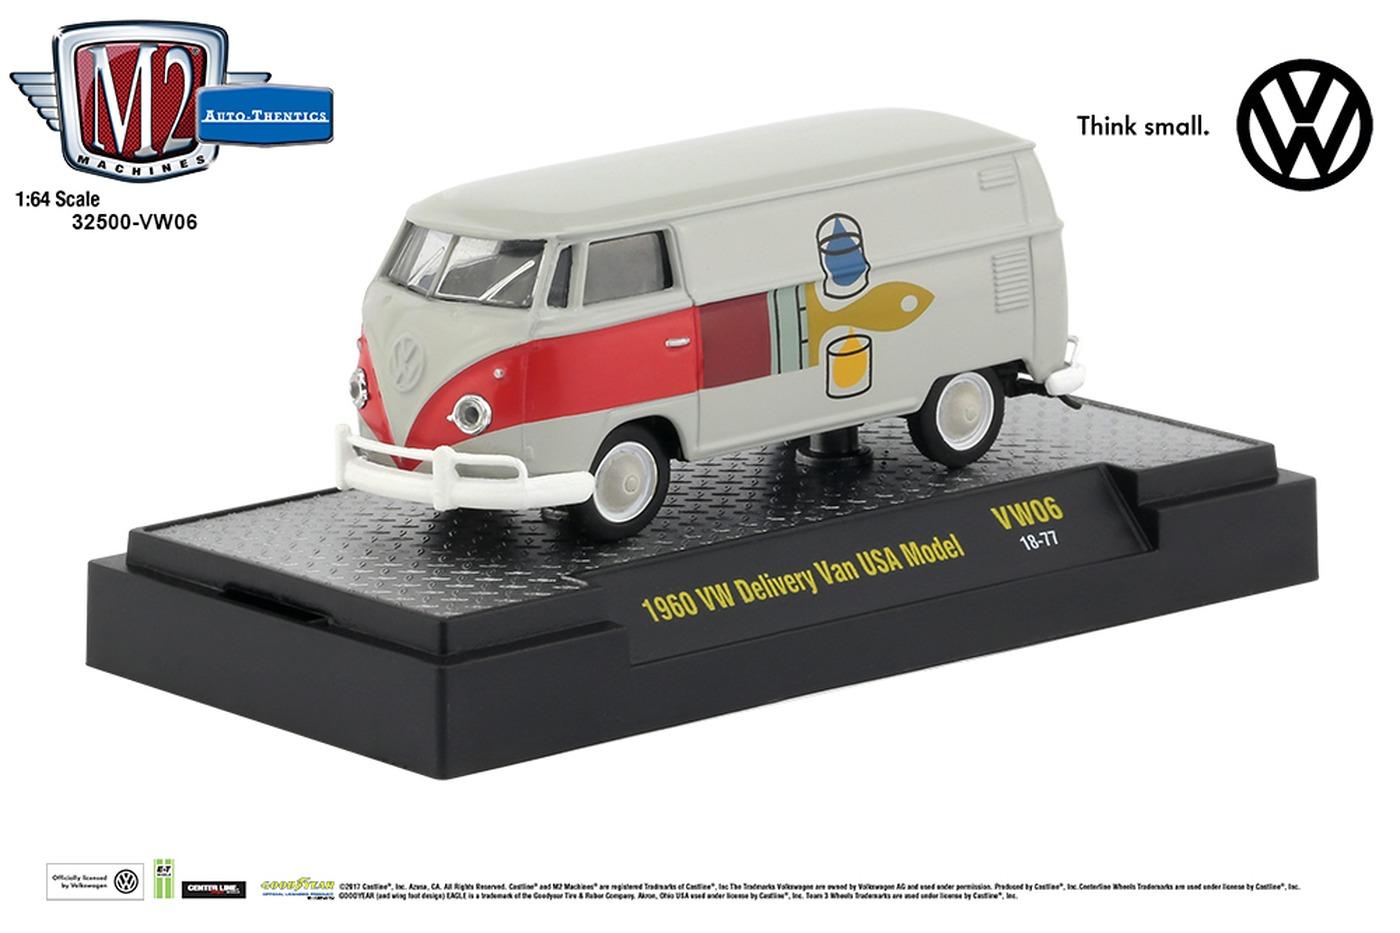 M2-32500-VW06